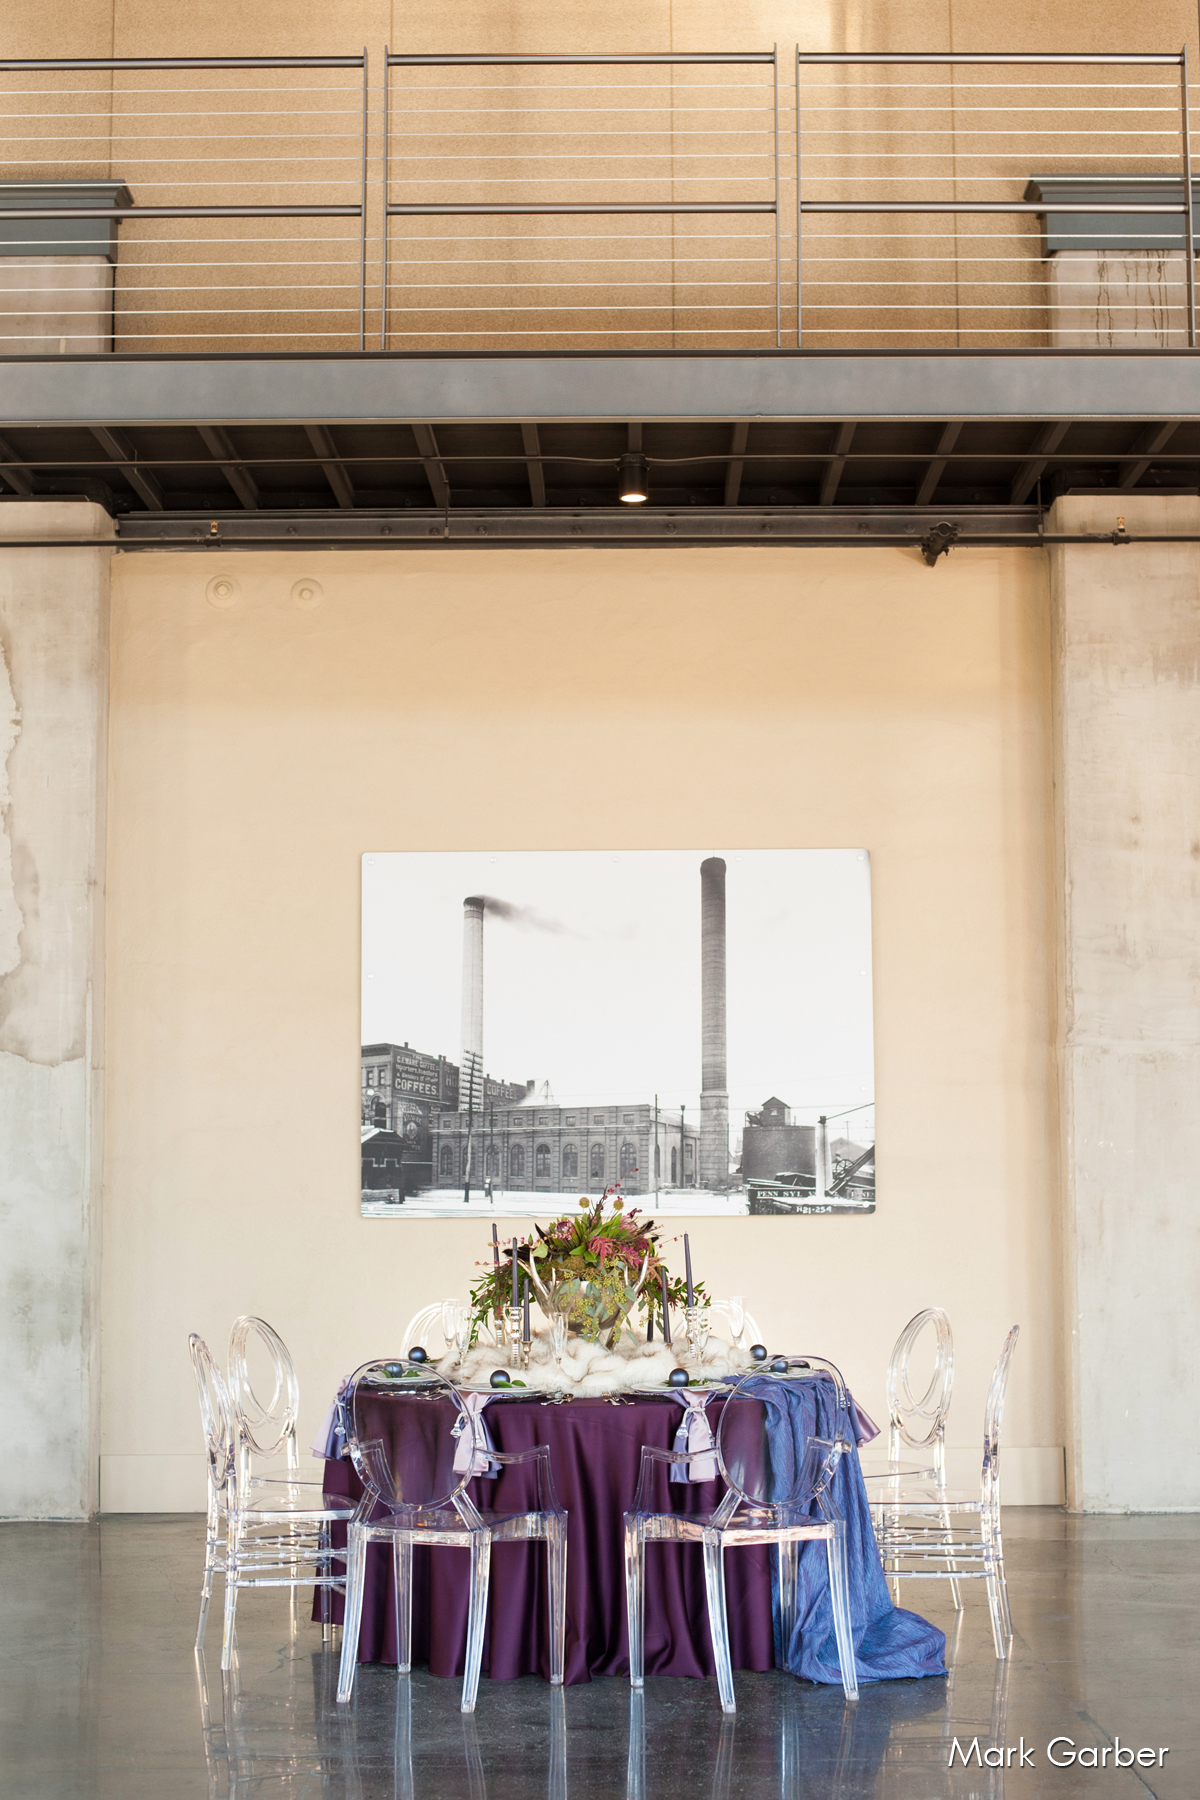 steam-plant-dayton-wedding-event-venue-elite-catering-mark-garber_007.jpg